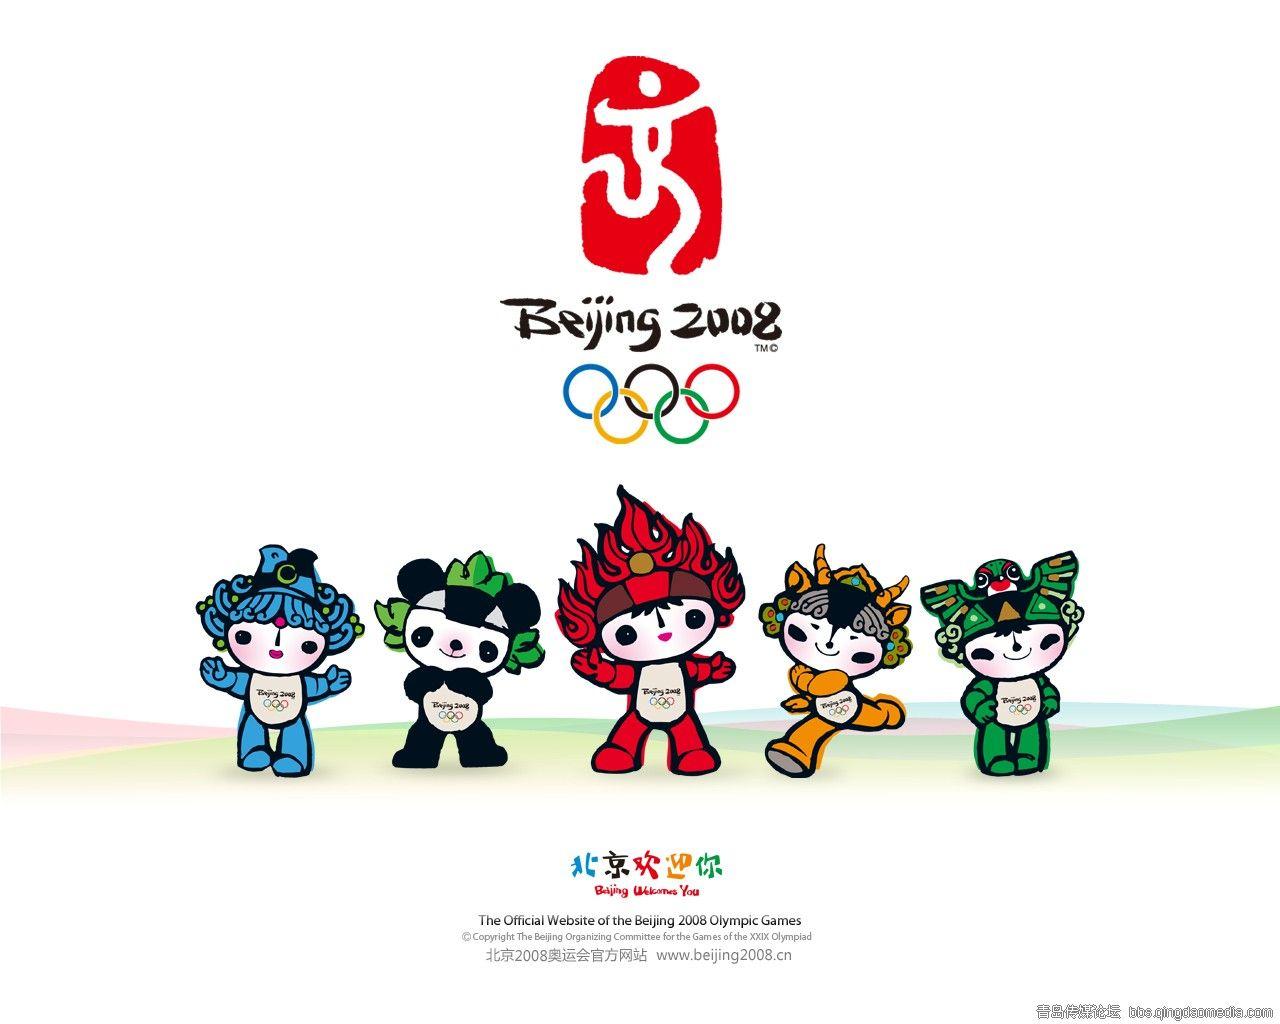 2008-beijing-olympics-mascots